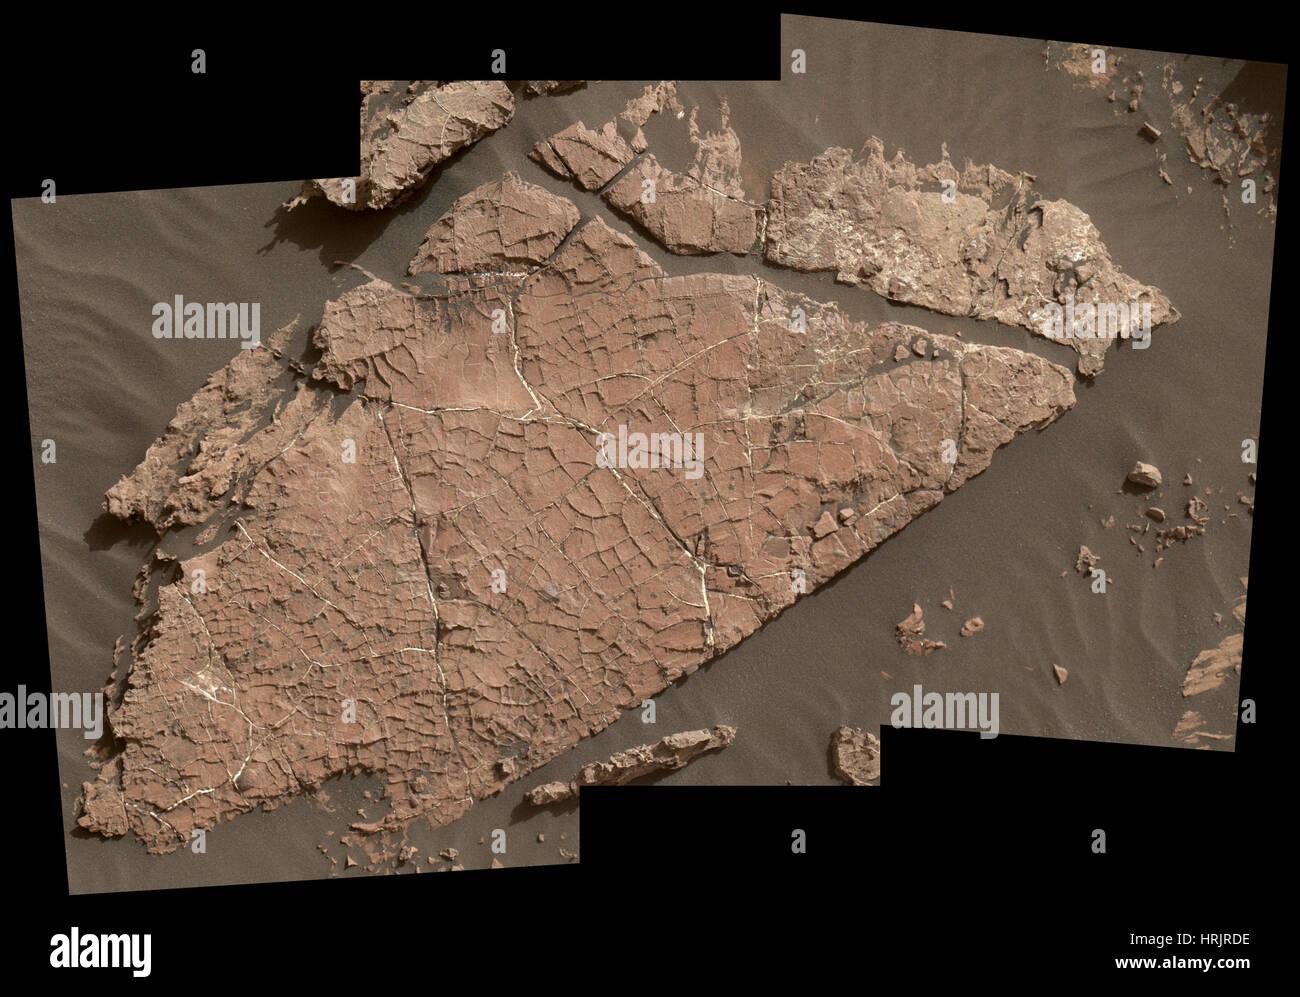 Cracks in Martian Rock - Stock Image